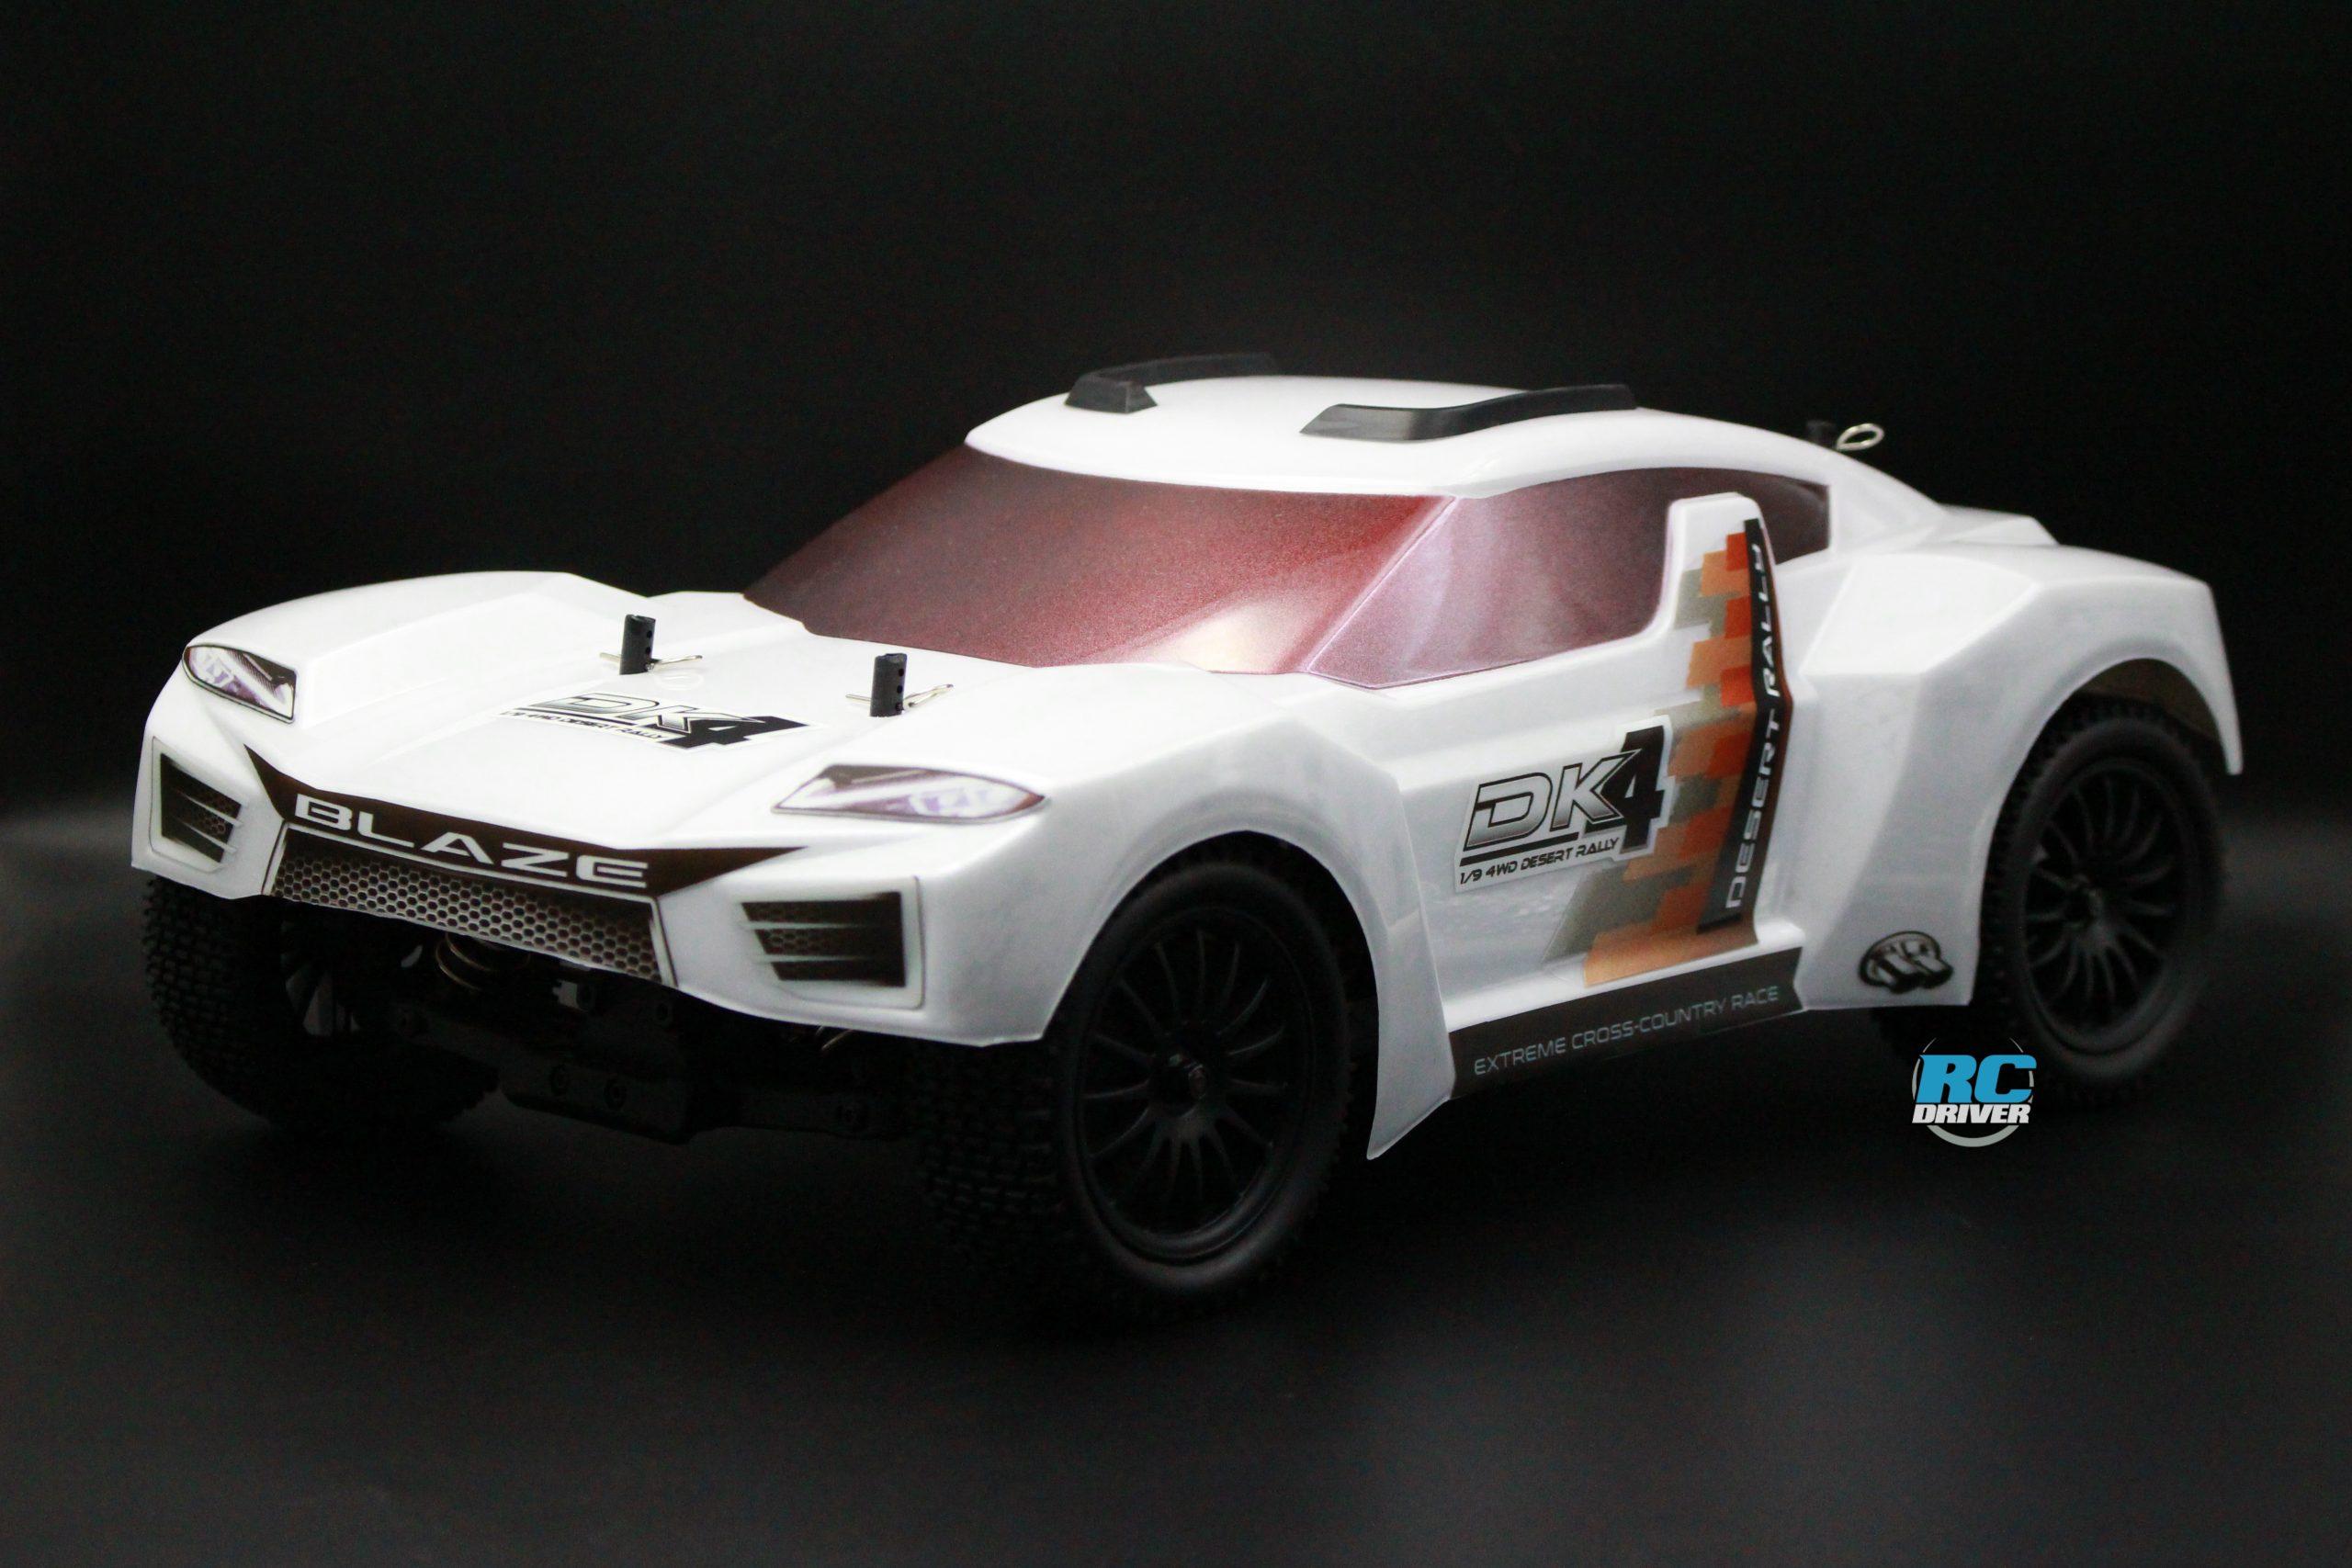 Blaze DK4 1/9 4WD Desert Rally: Dual-Purpose Racer